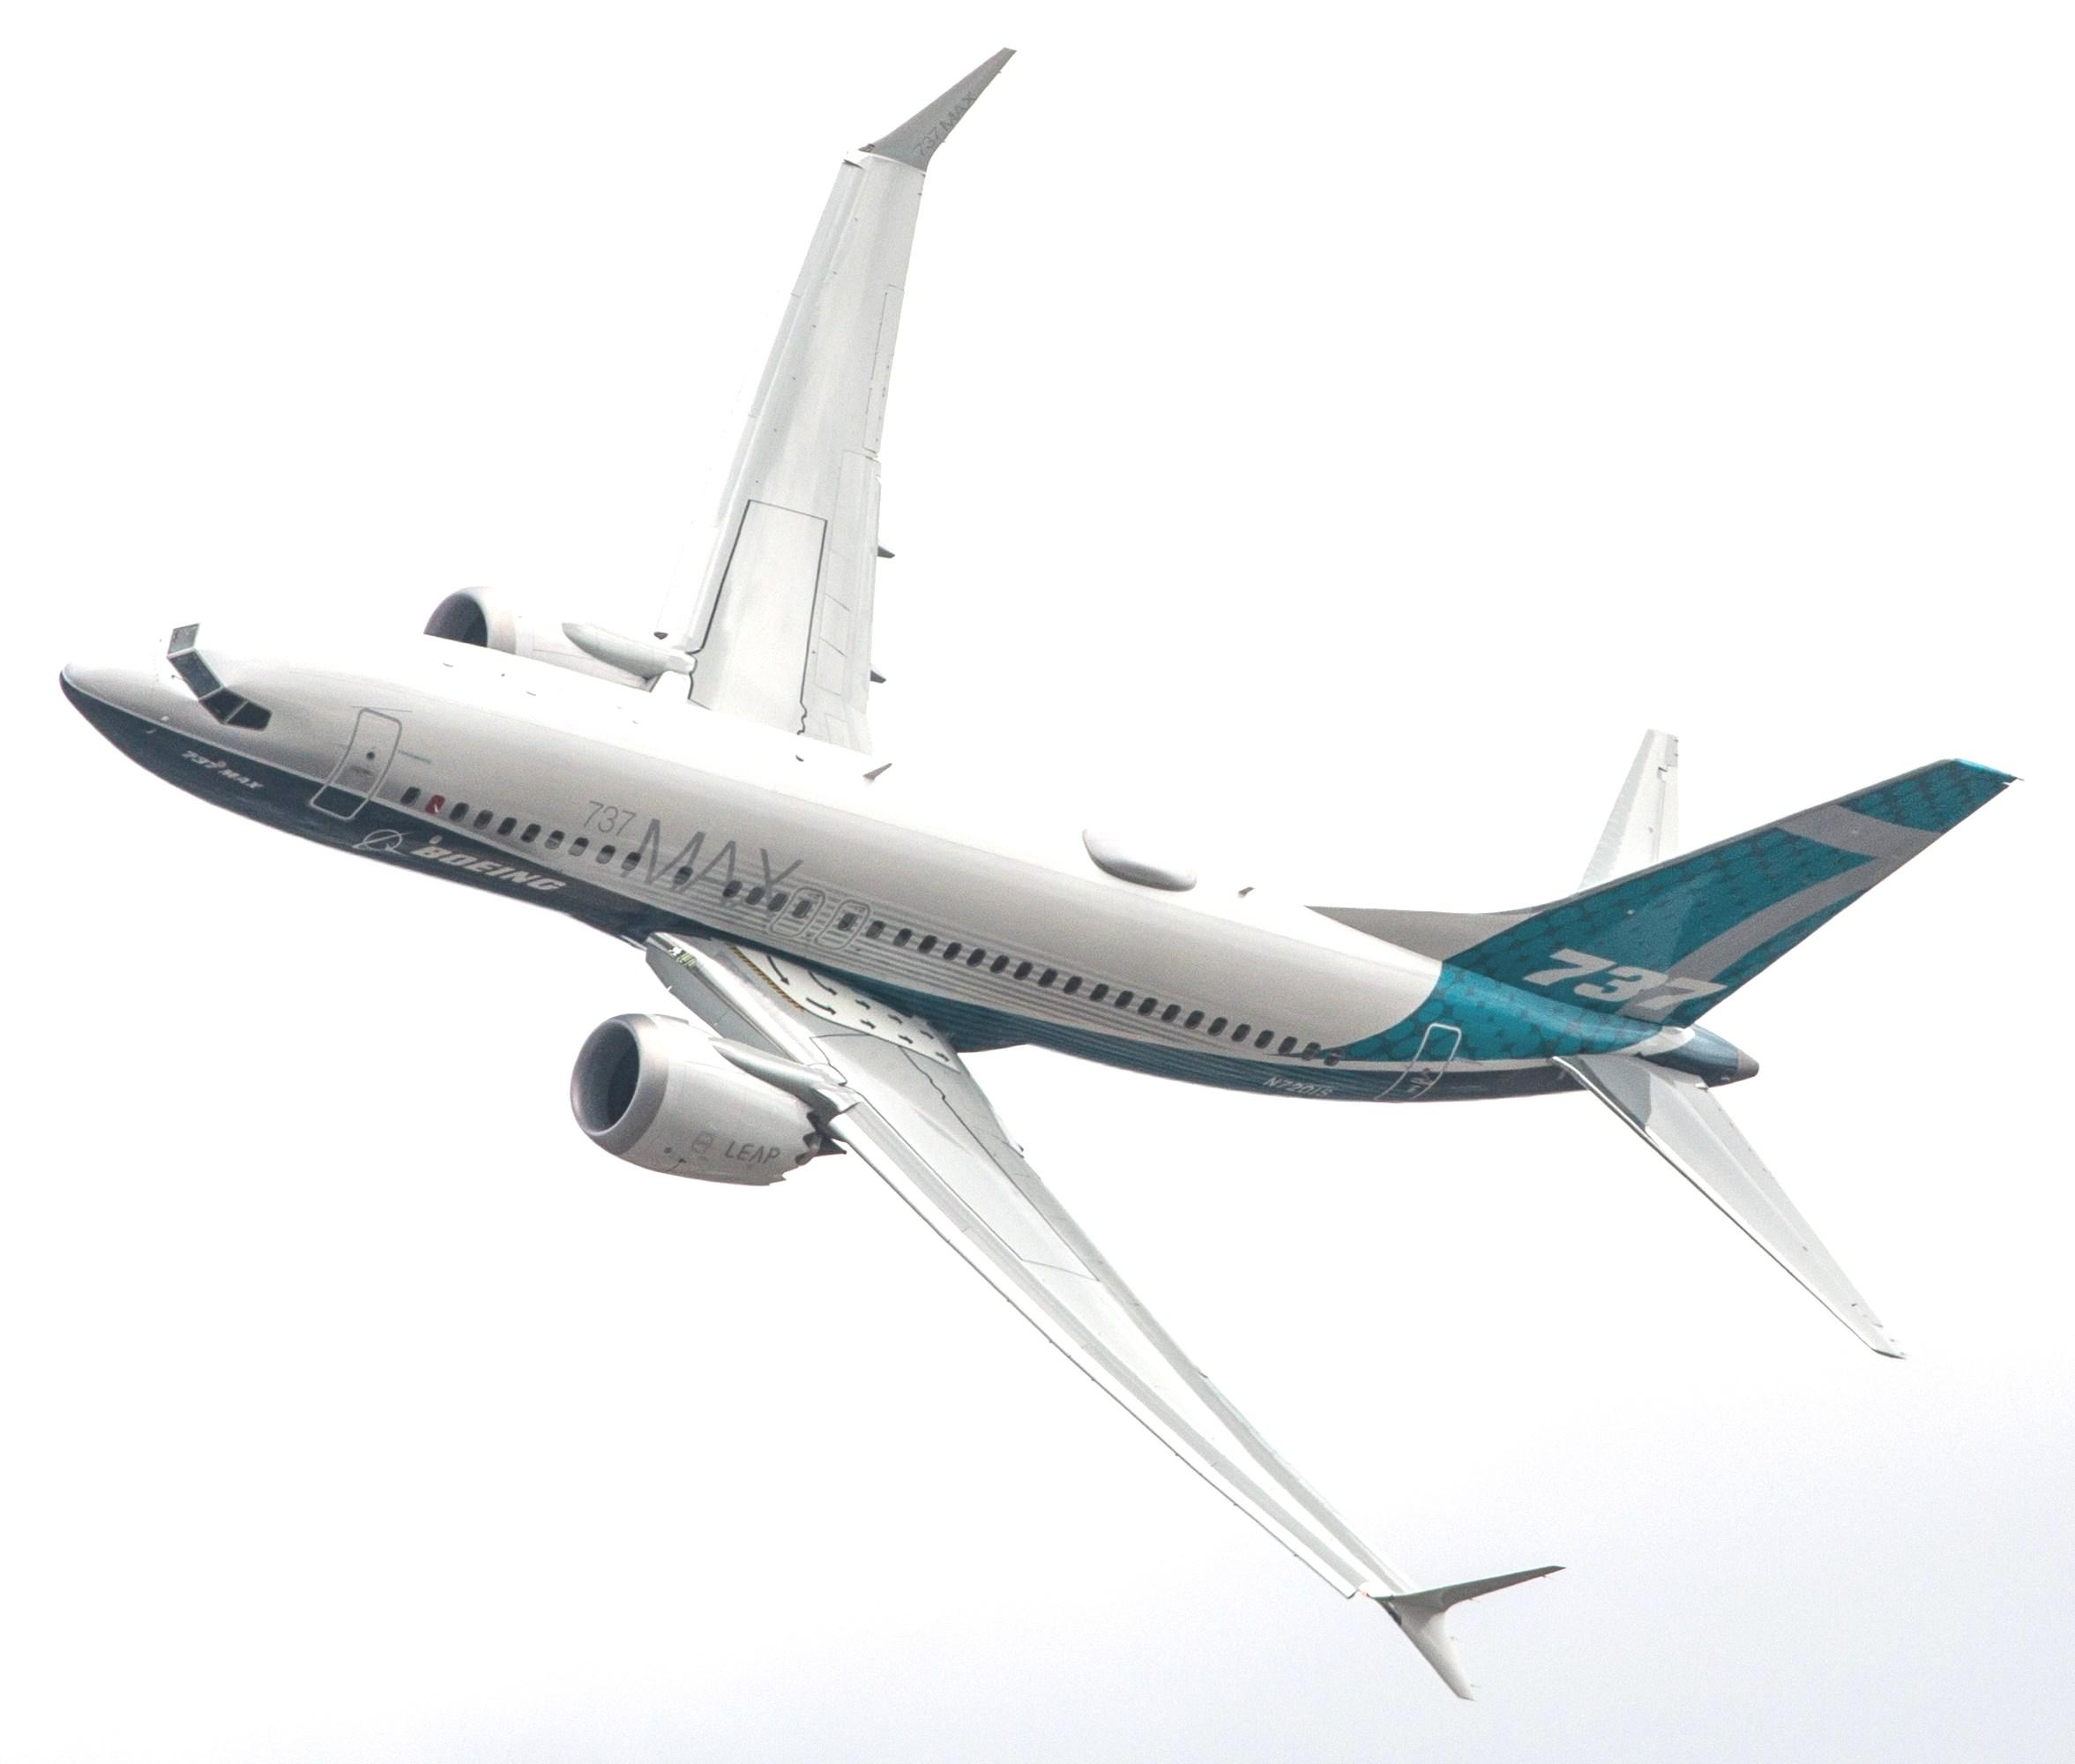 AW-7373337